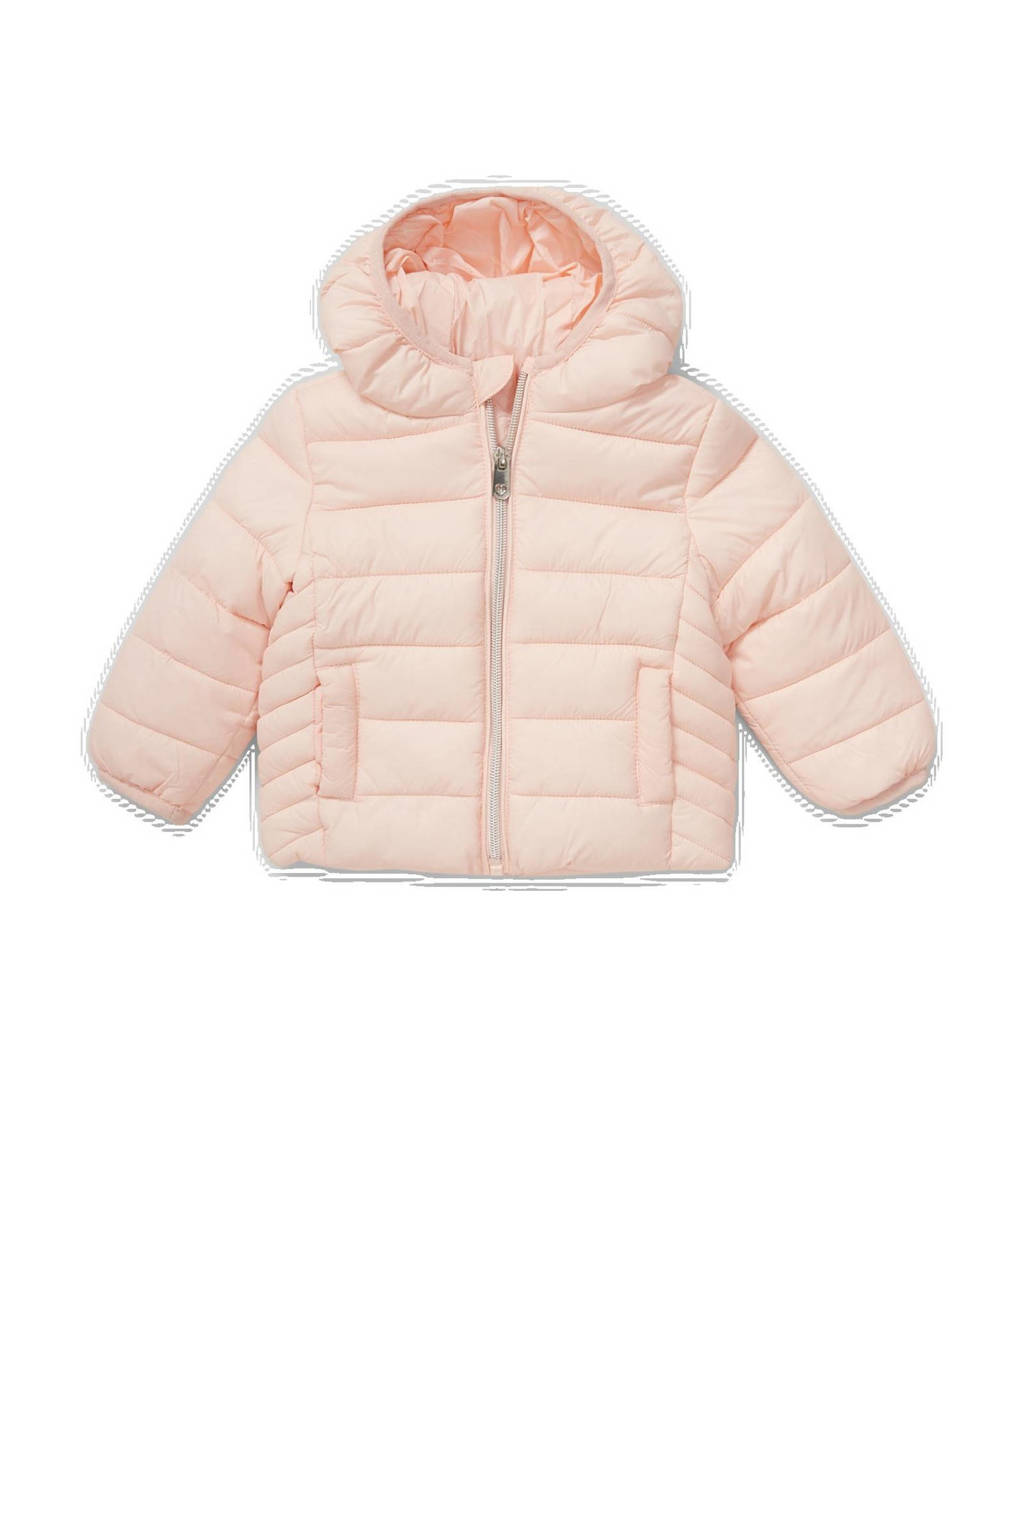 C&A Baby Club baby gewatteerde jas lichtroze, Lichtroze